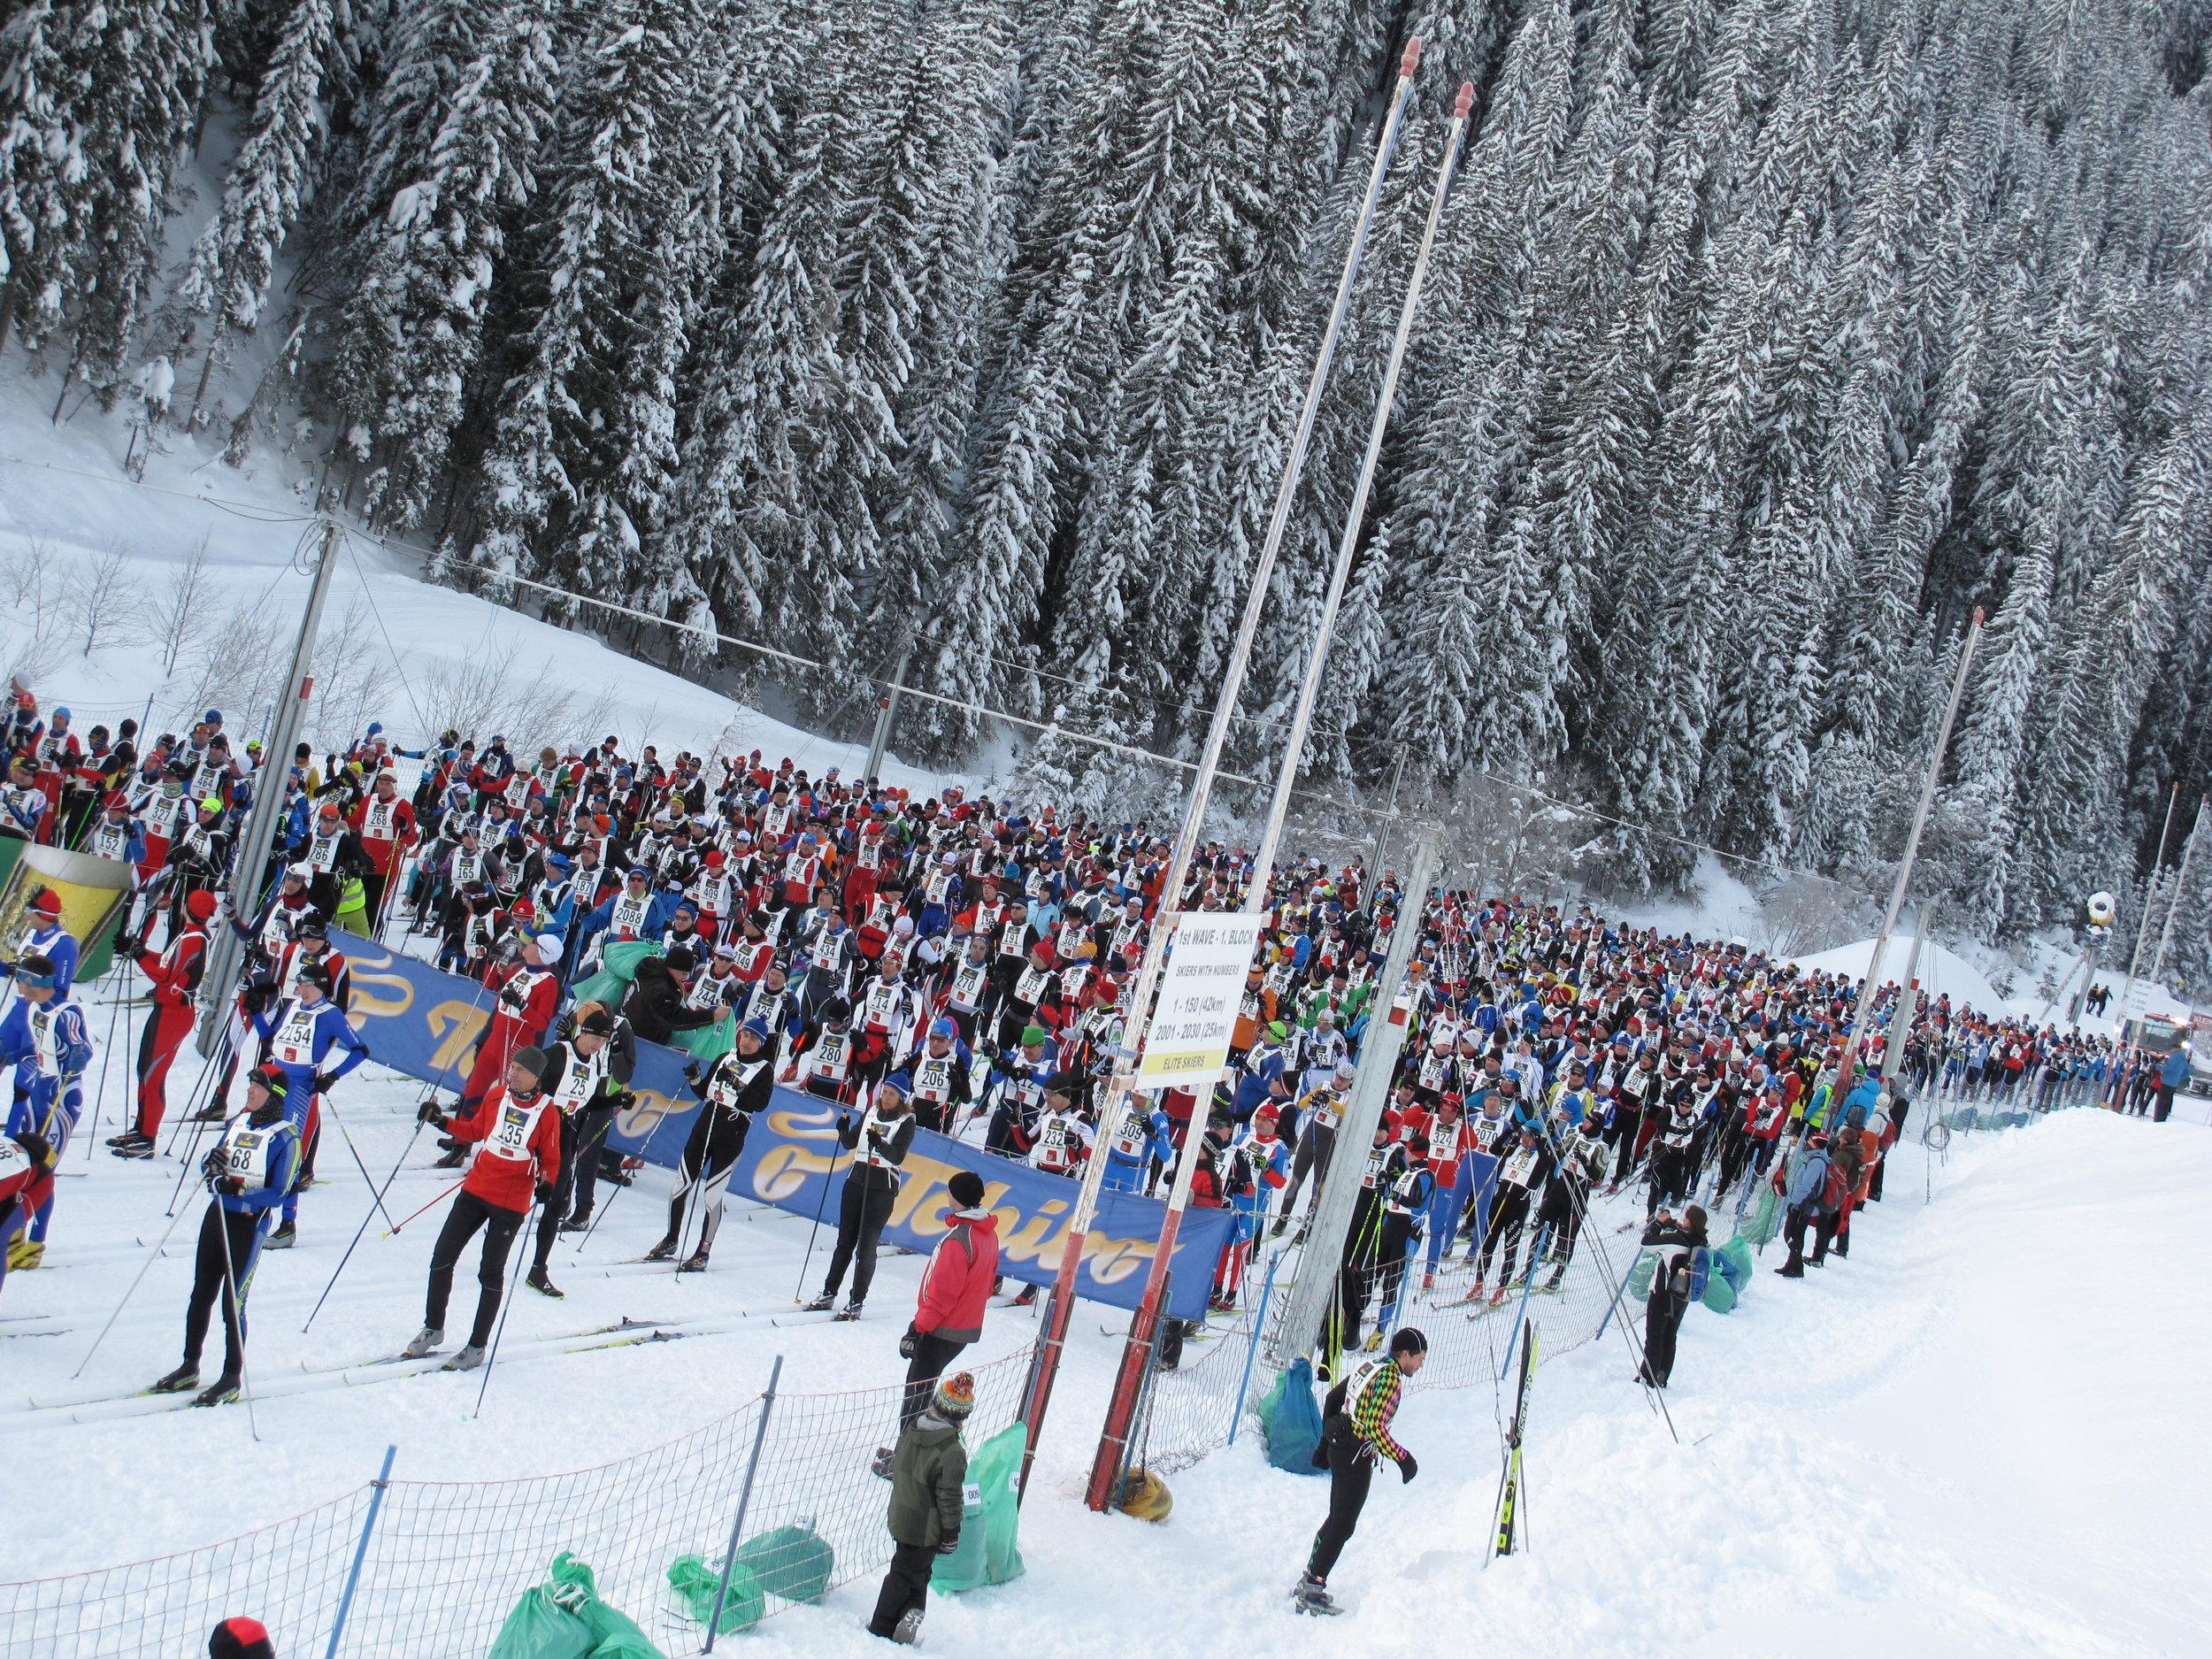 Start of the Dolomitenlauf classic race